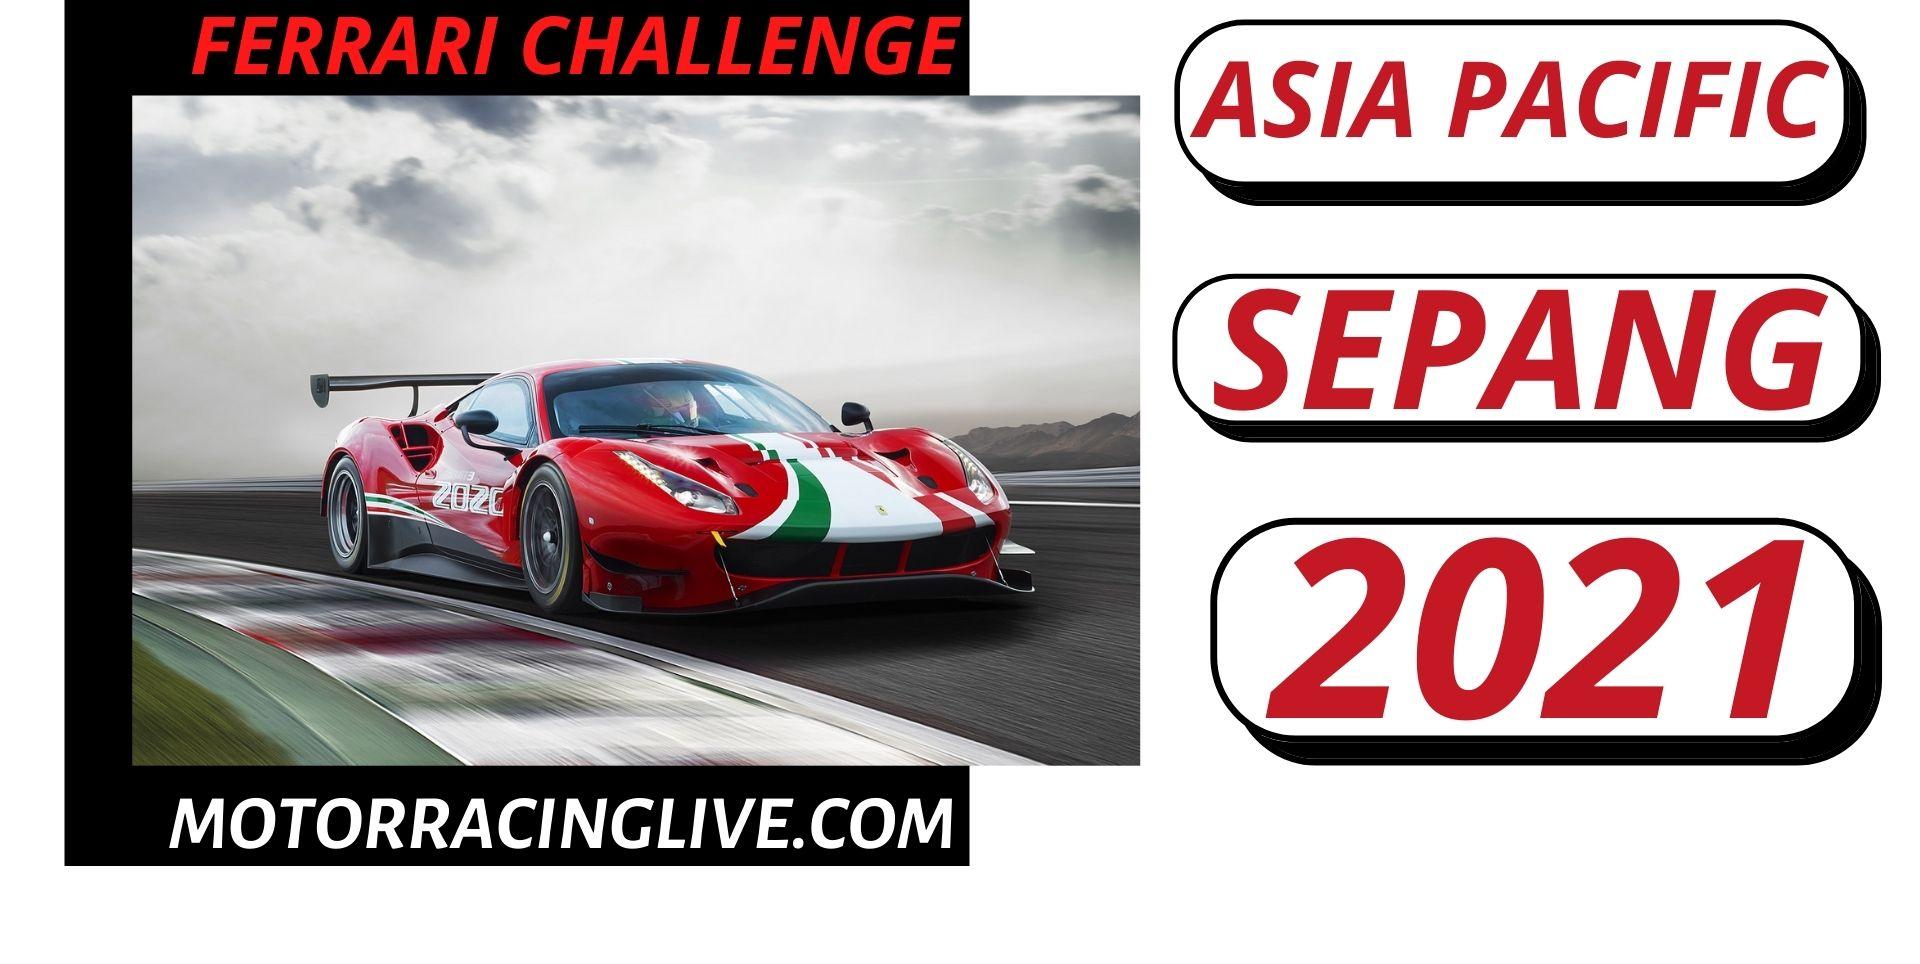 Sepang Ferrari Challenge Asia Pacific Live Stream 2021